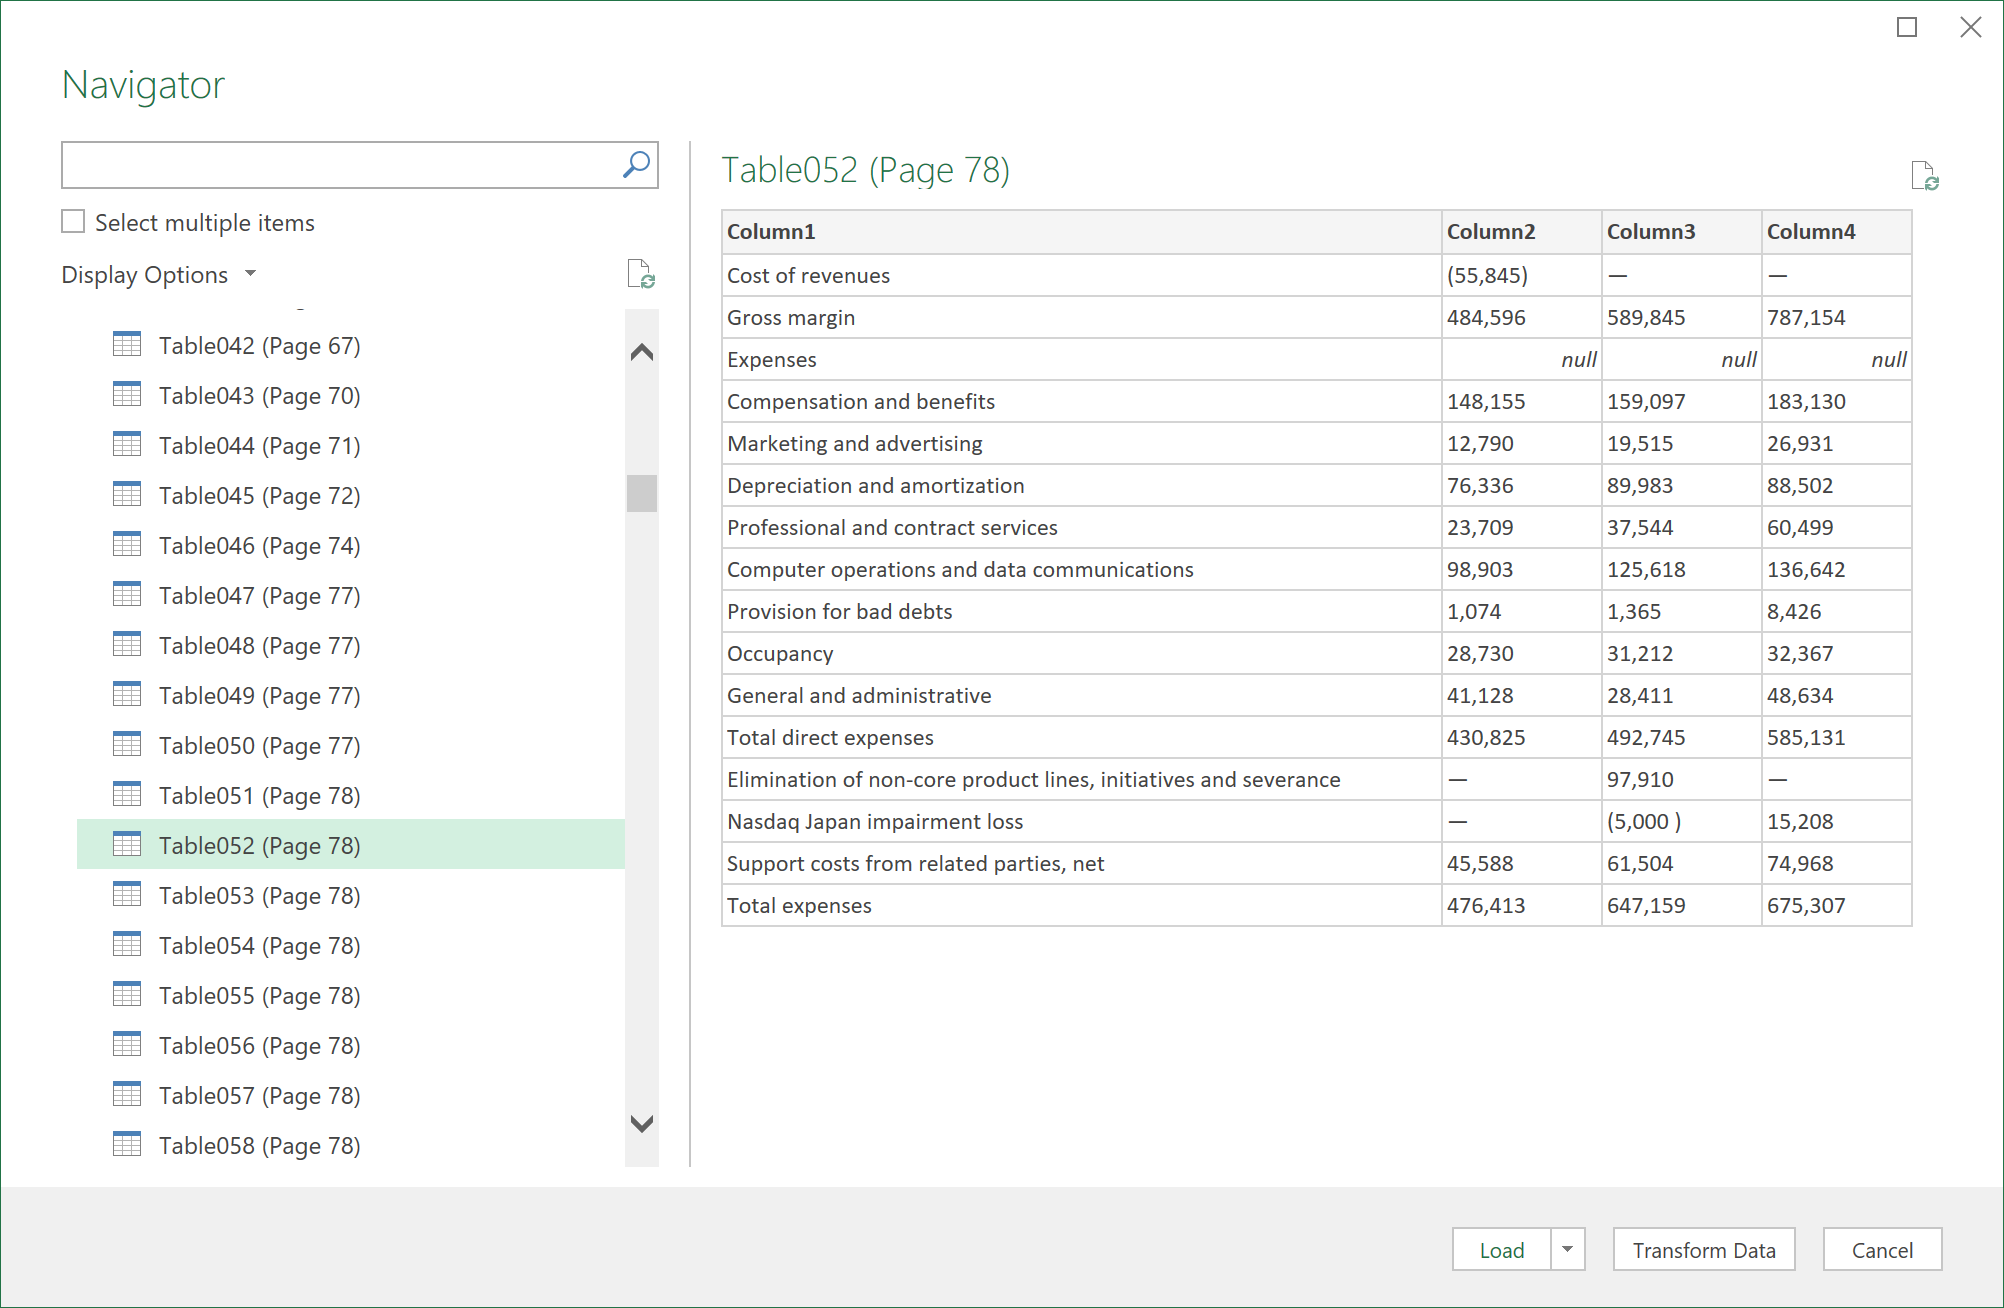 Navigator-valinta ikkuna PDF-tietojen tuontia varten